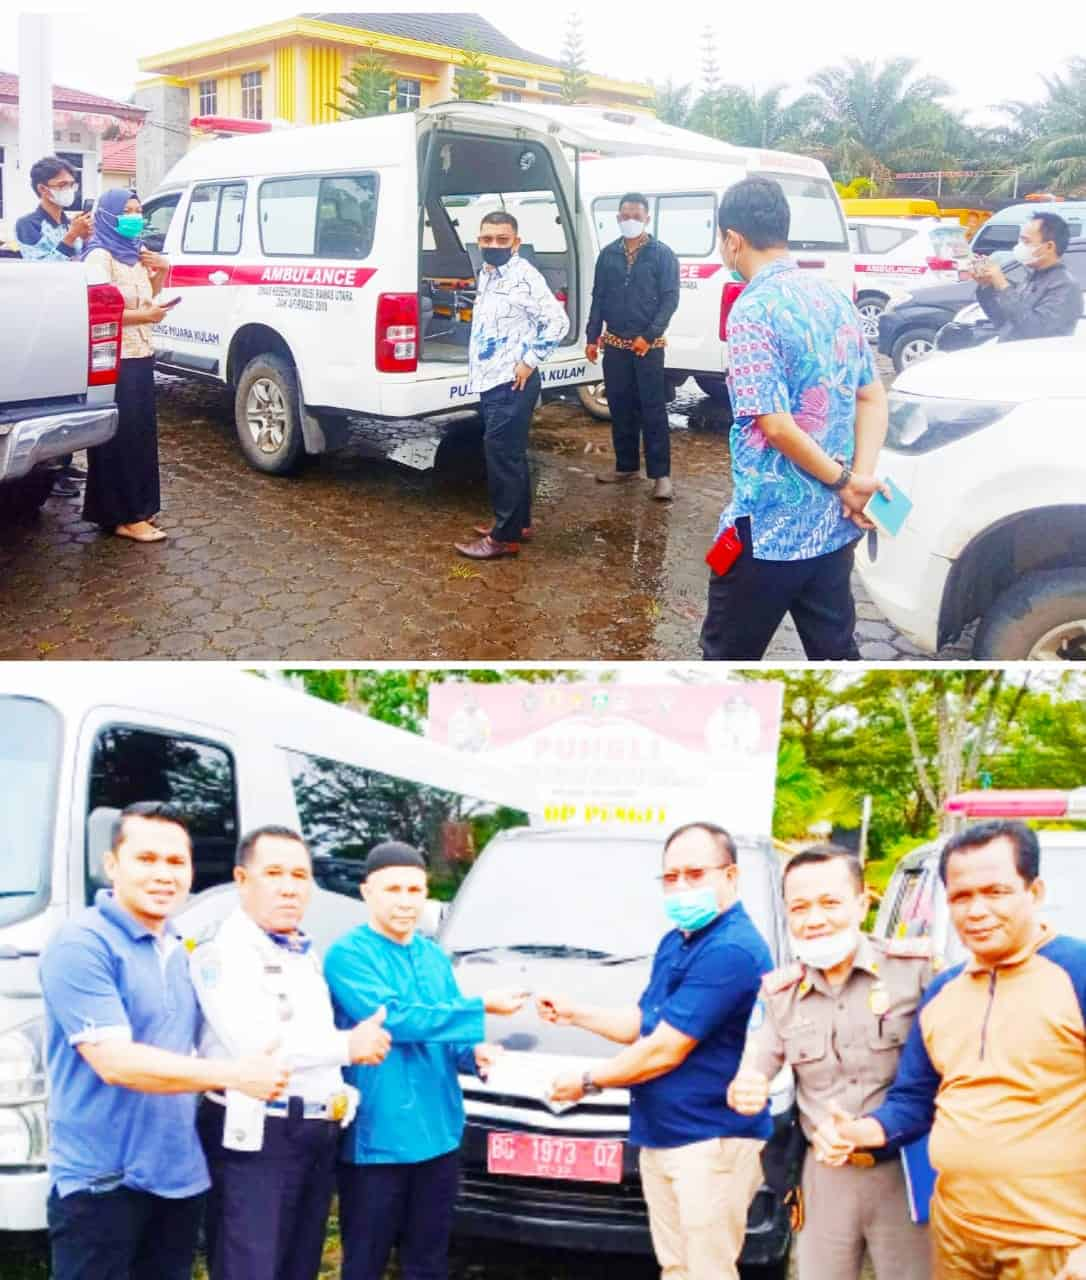 Bupati Muratara H. Devi Suhartoni Cek Fisik Mobil Dinas,Kecewa…